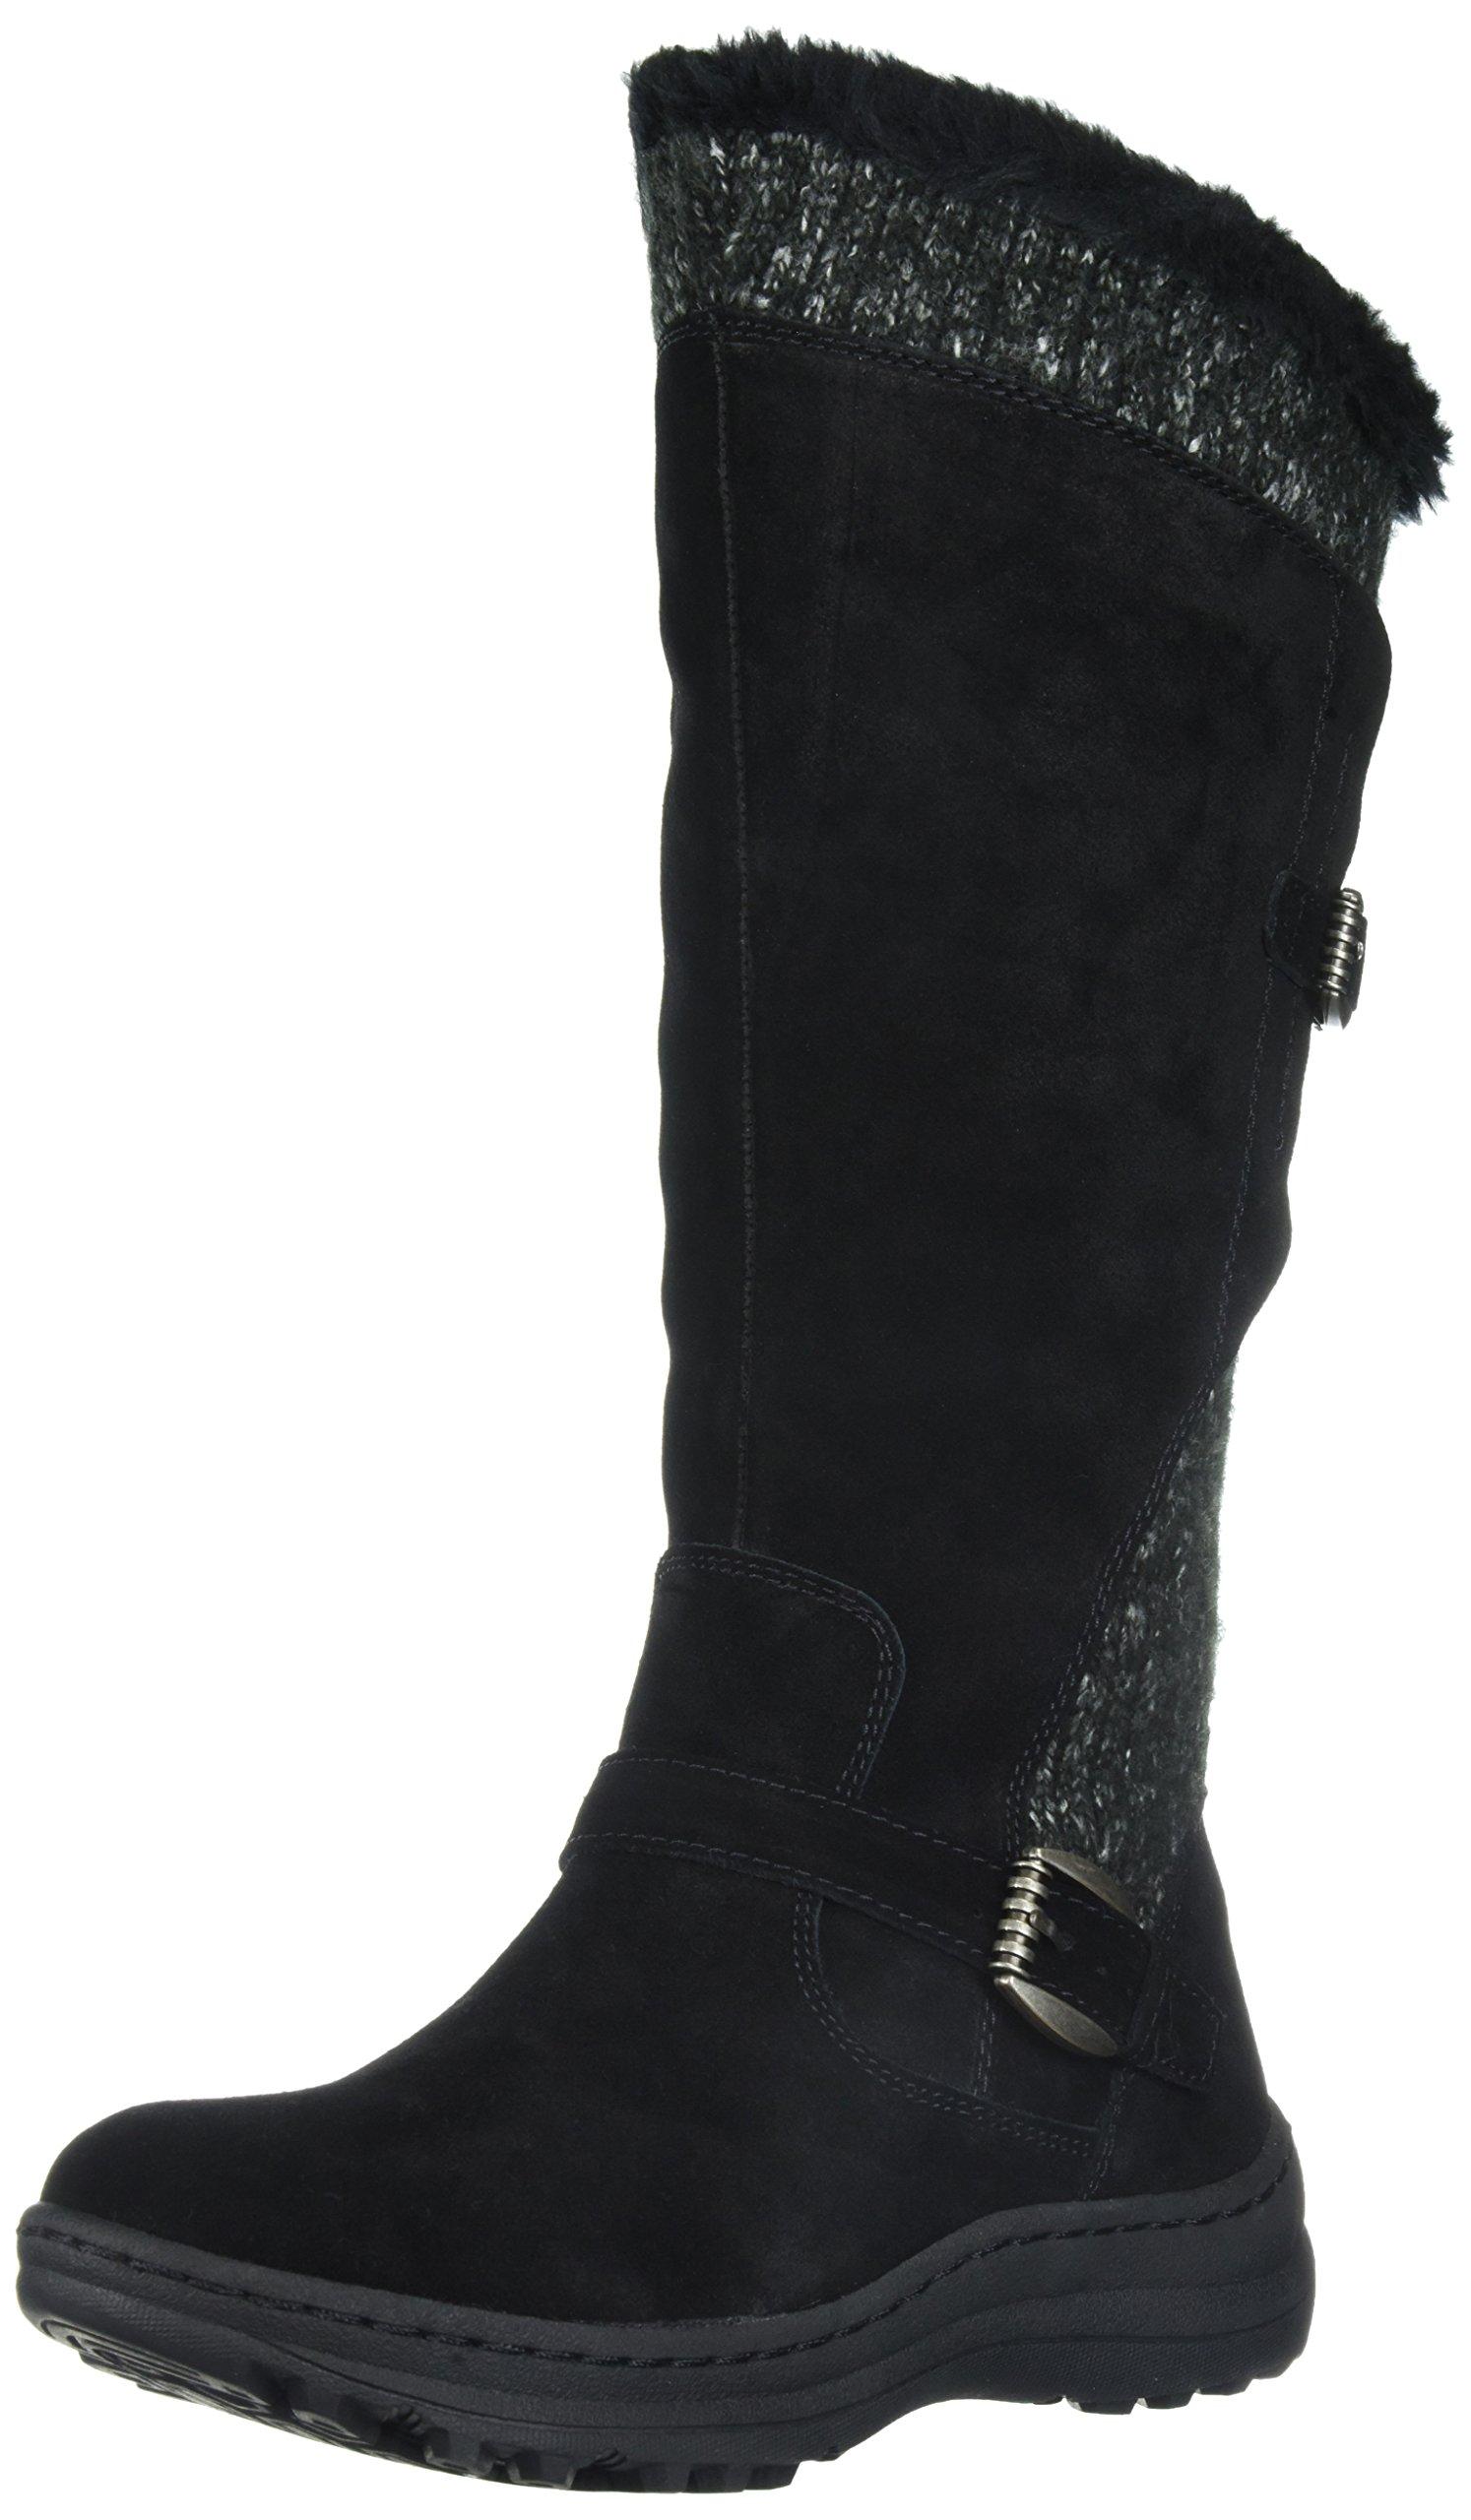 BareTraps Women's Alira Snow Boot,Black,7.5 M US